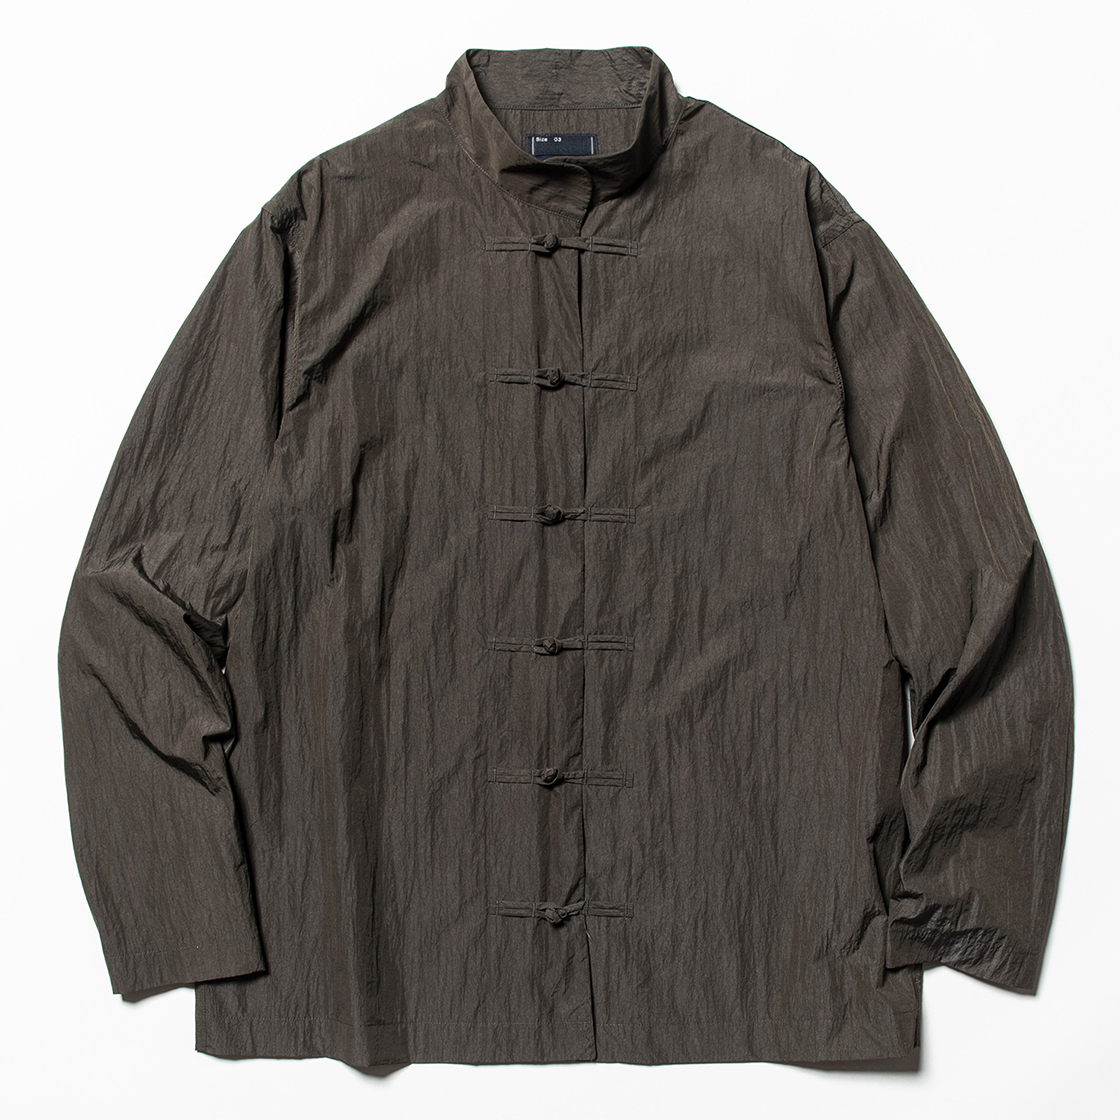 Nylon Mao-Collar SH Charcoal